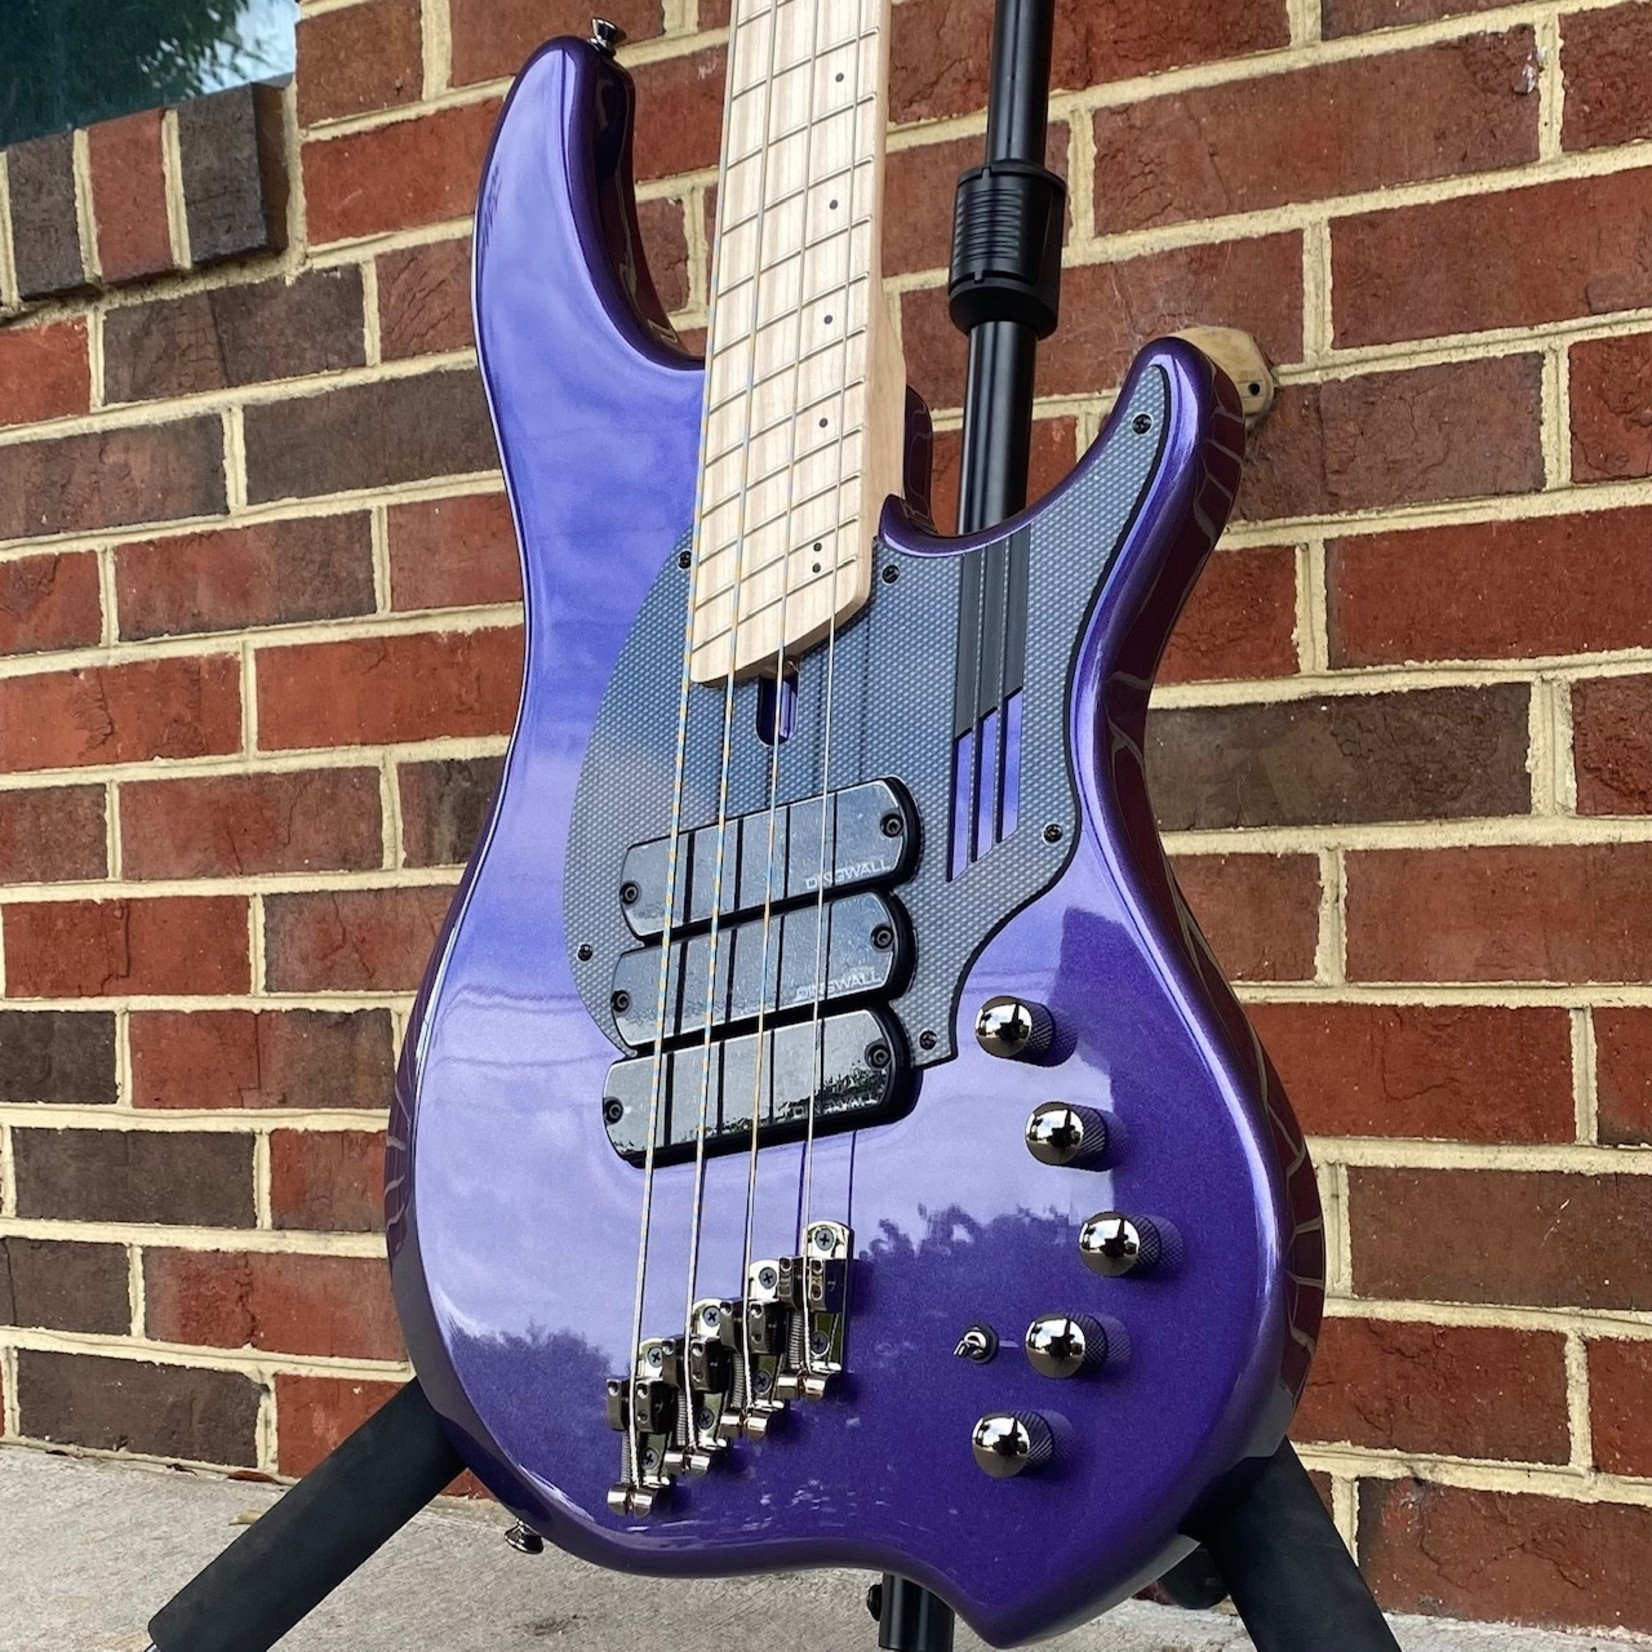 Dingwall Dingwall NG3 4-String, 3x Pickups, Purple Metallic, Maple Fretboard, Matching Headstock, Dingwall Gig Bag